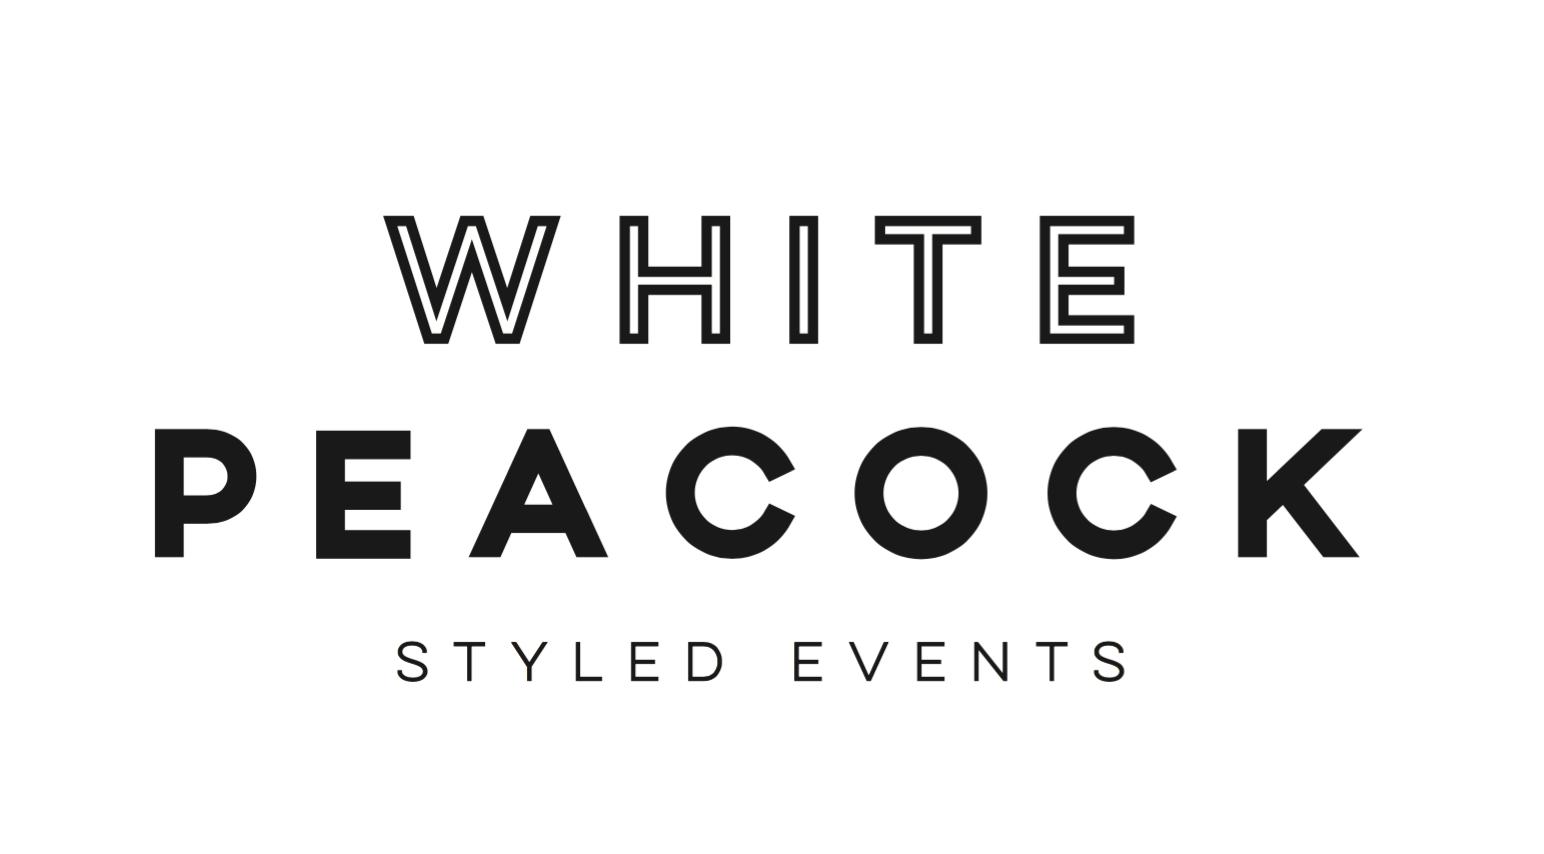 white-peackock-white-loft-creative-3